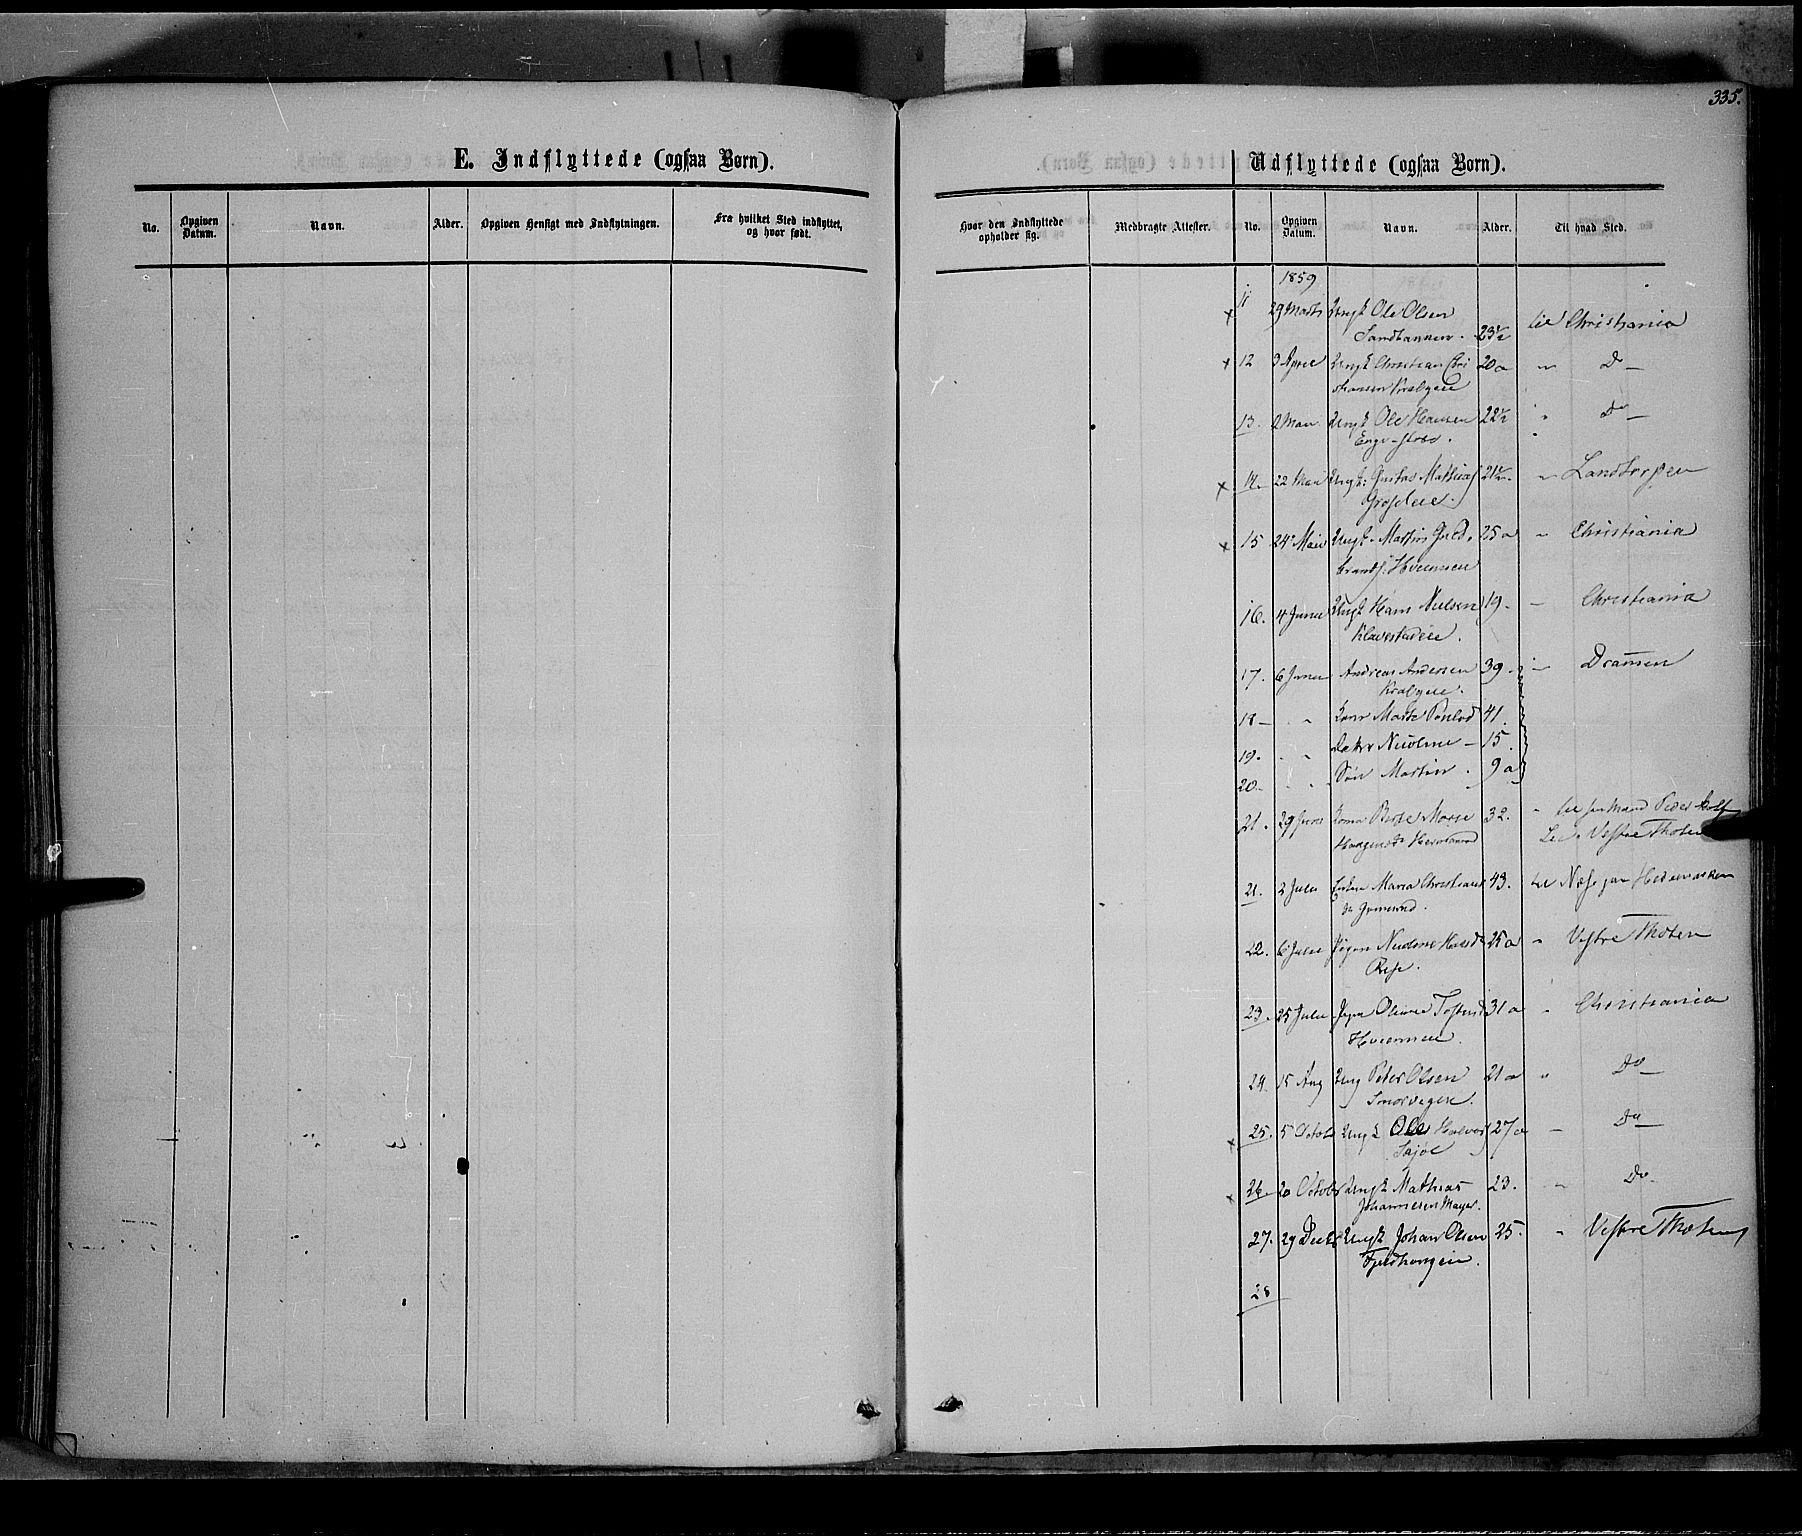 SAH, Østre Toten prestekontor, Ministerialbok nr. 4, 1857-1865, s. 335